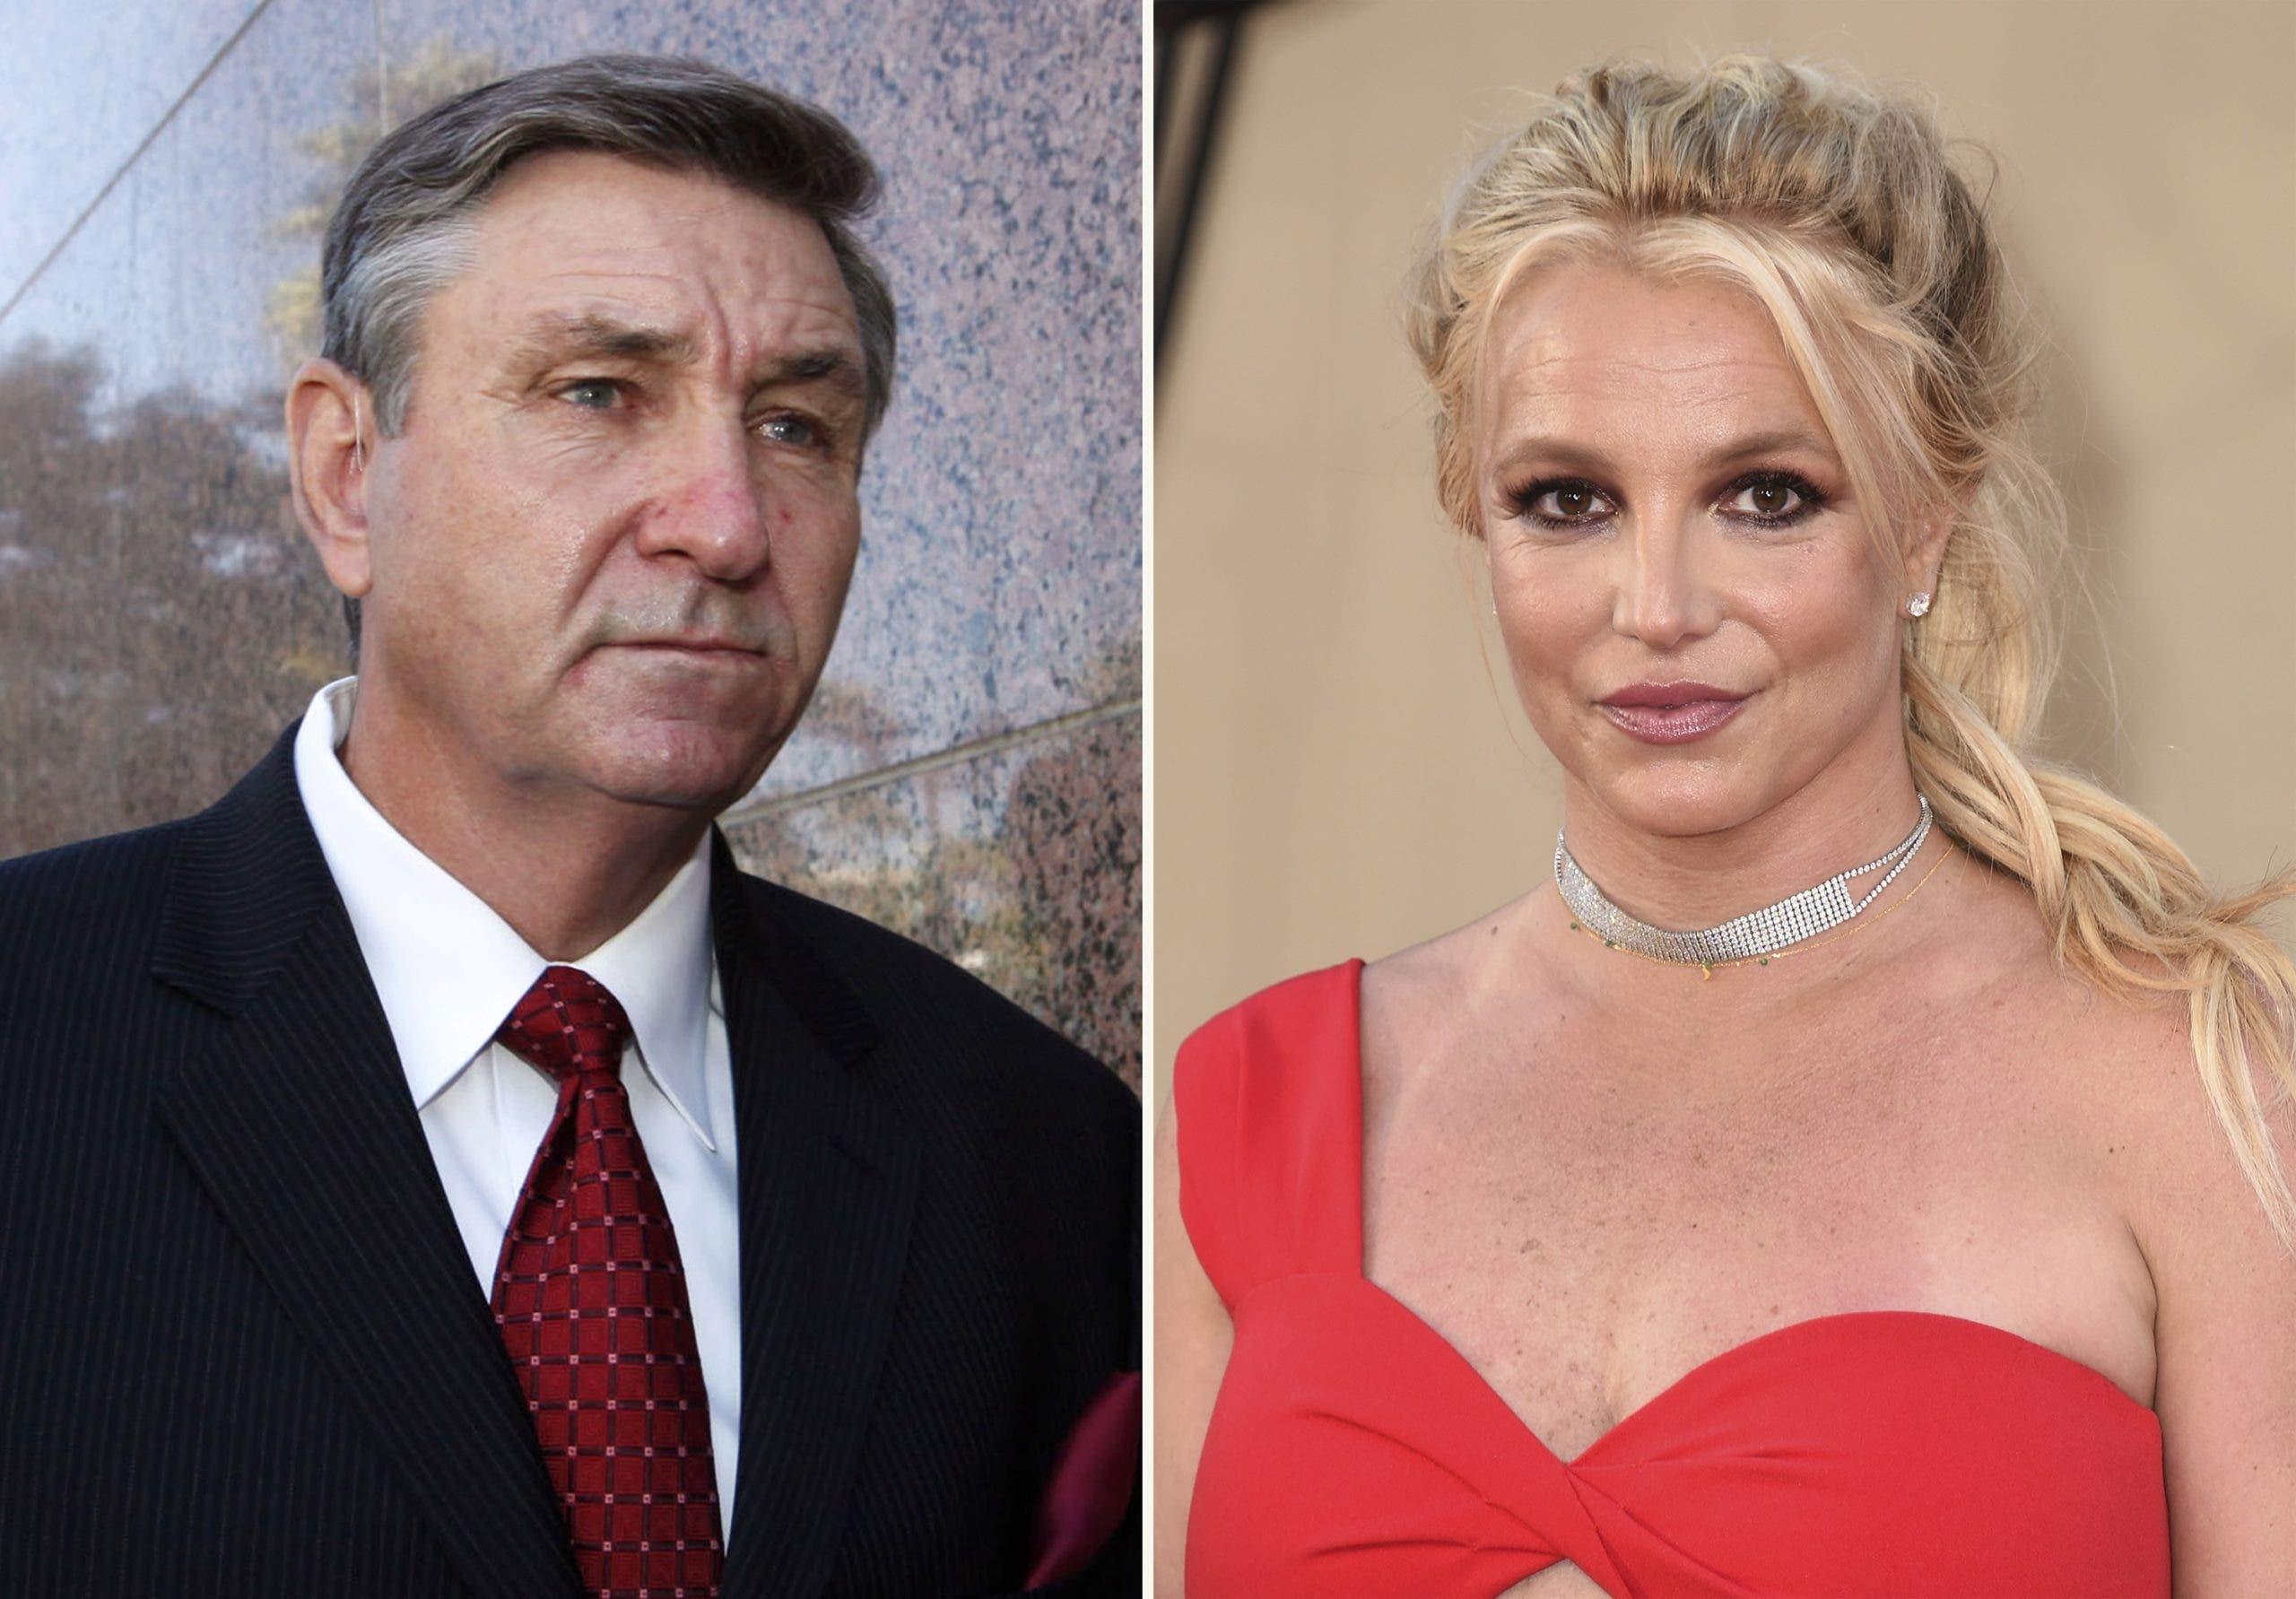 Jueza suspende a padre de Britney Spears de tutela